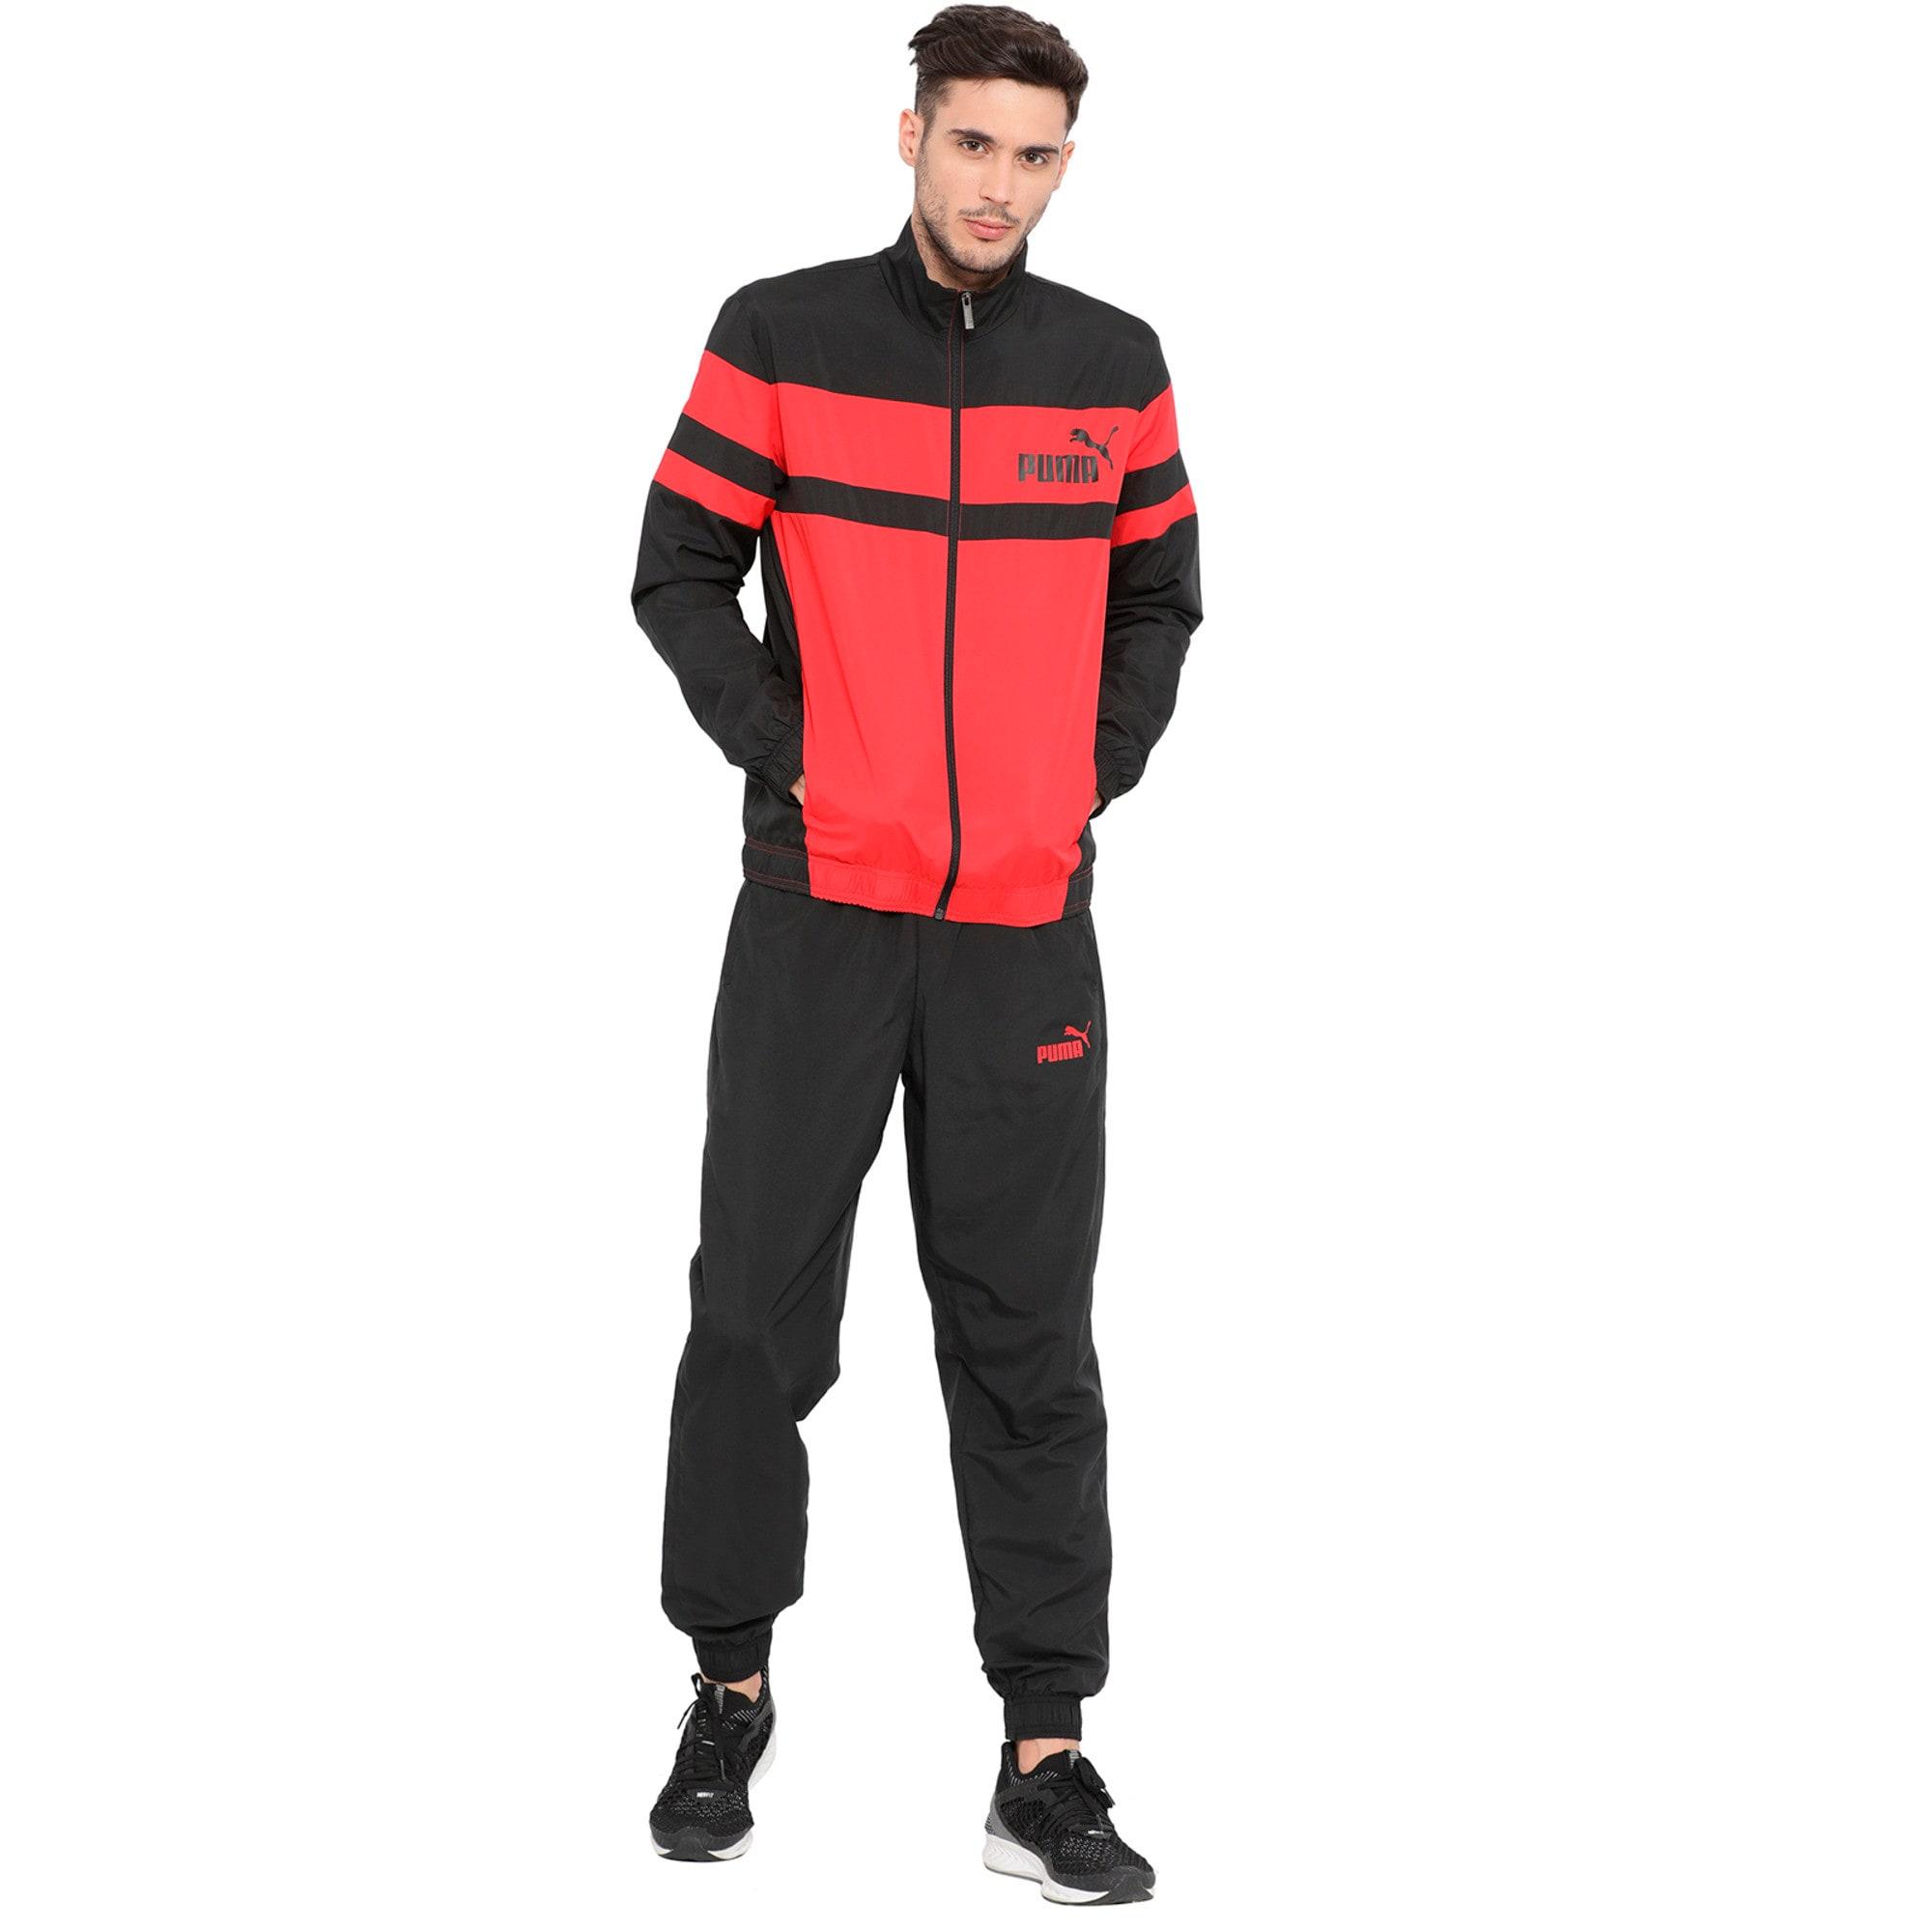 Thumbnail 4 of CB Woven Suit, Ribbon Red-Puma Black, medium-IND